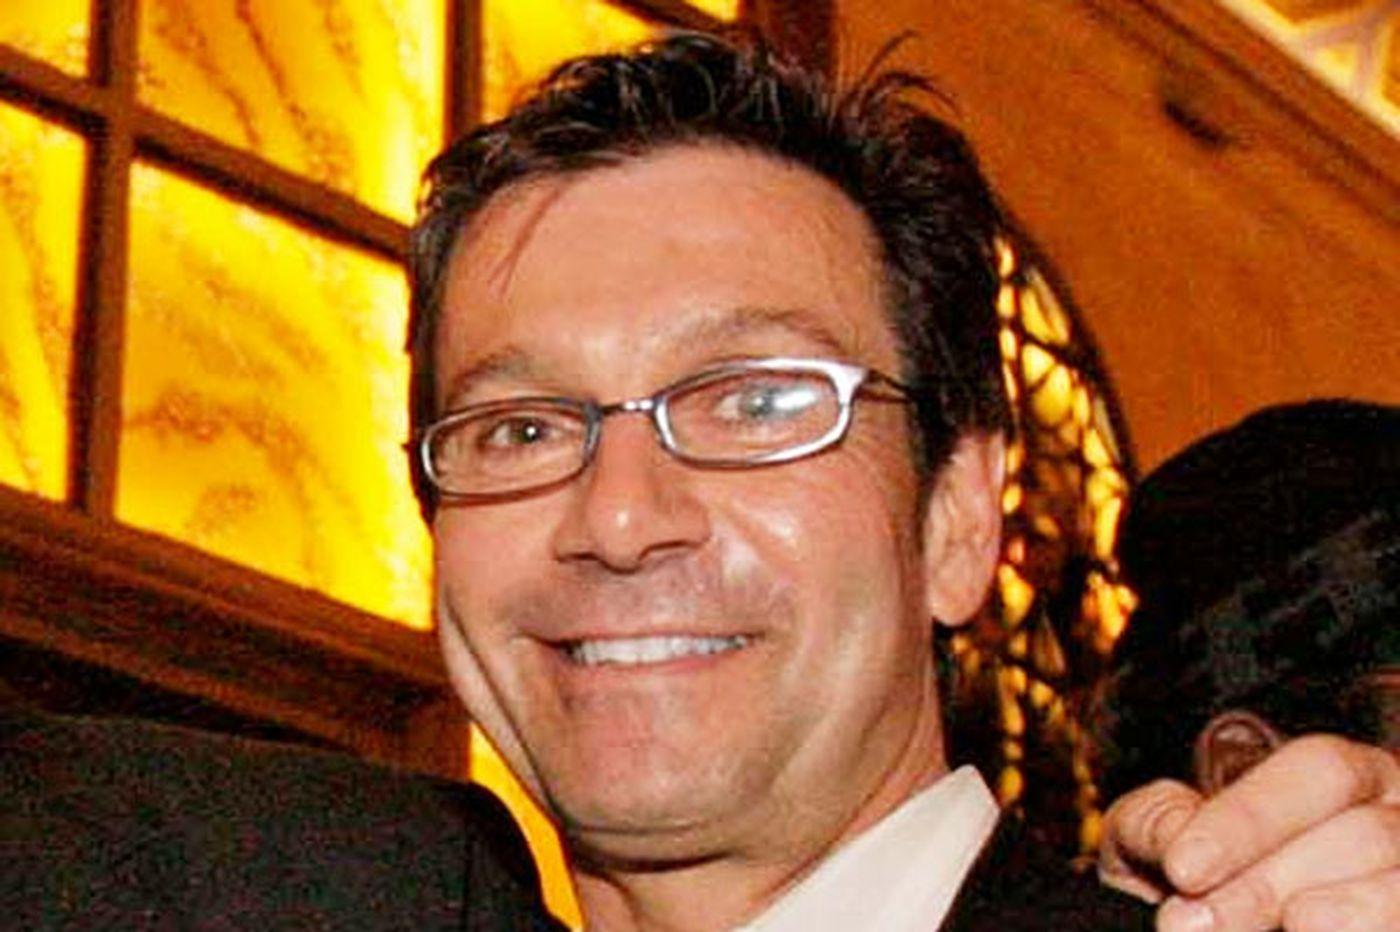 Bolaris-bilking masterminds found guilty